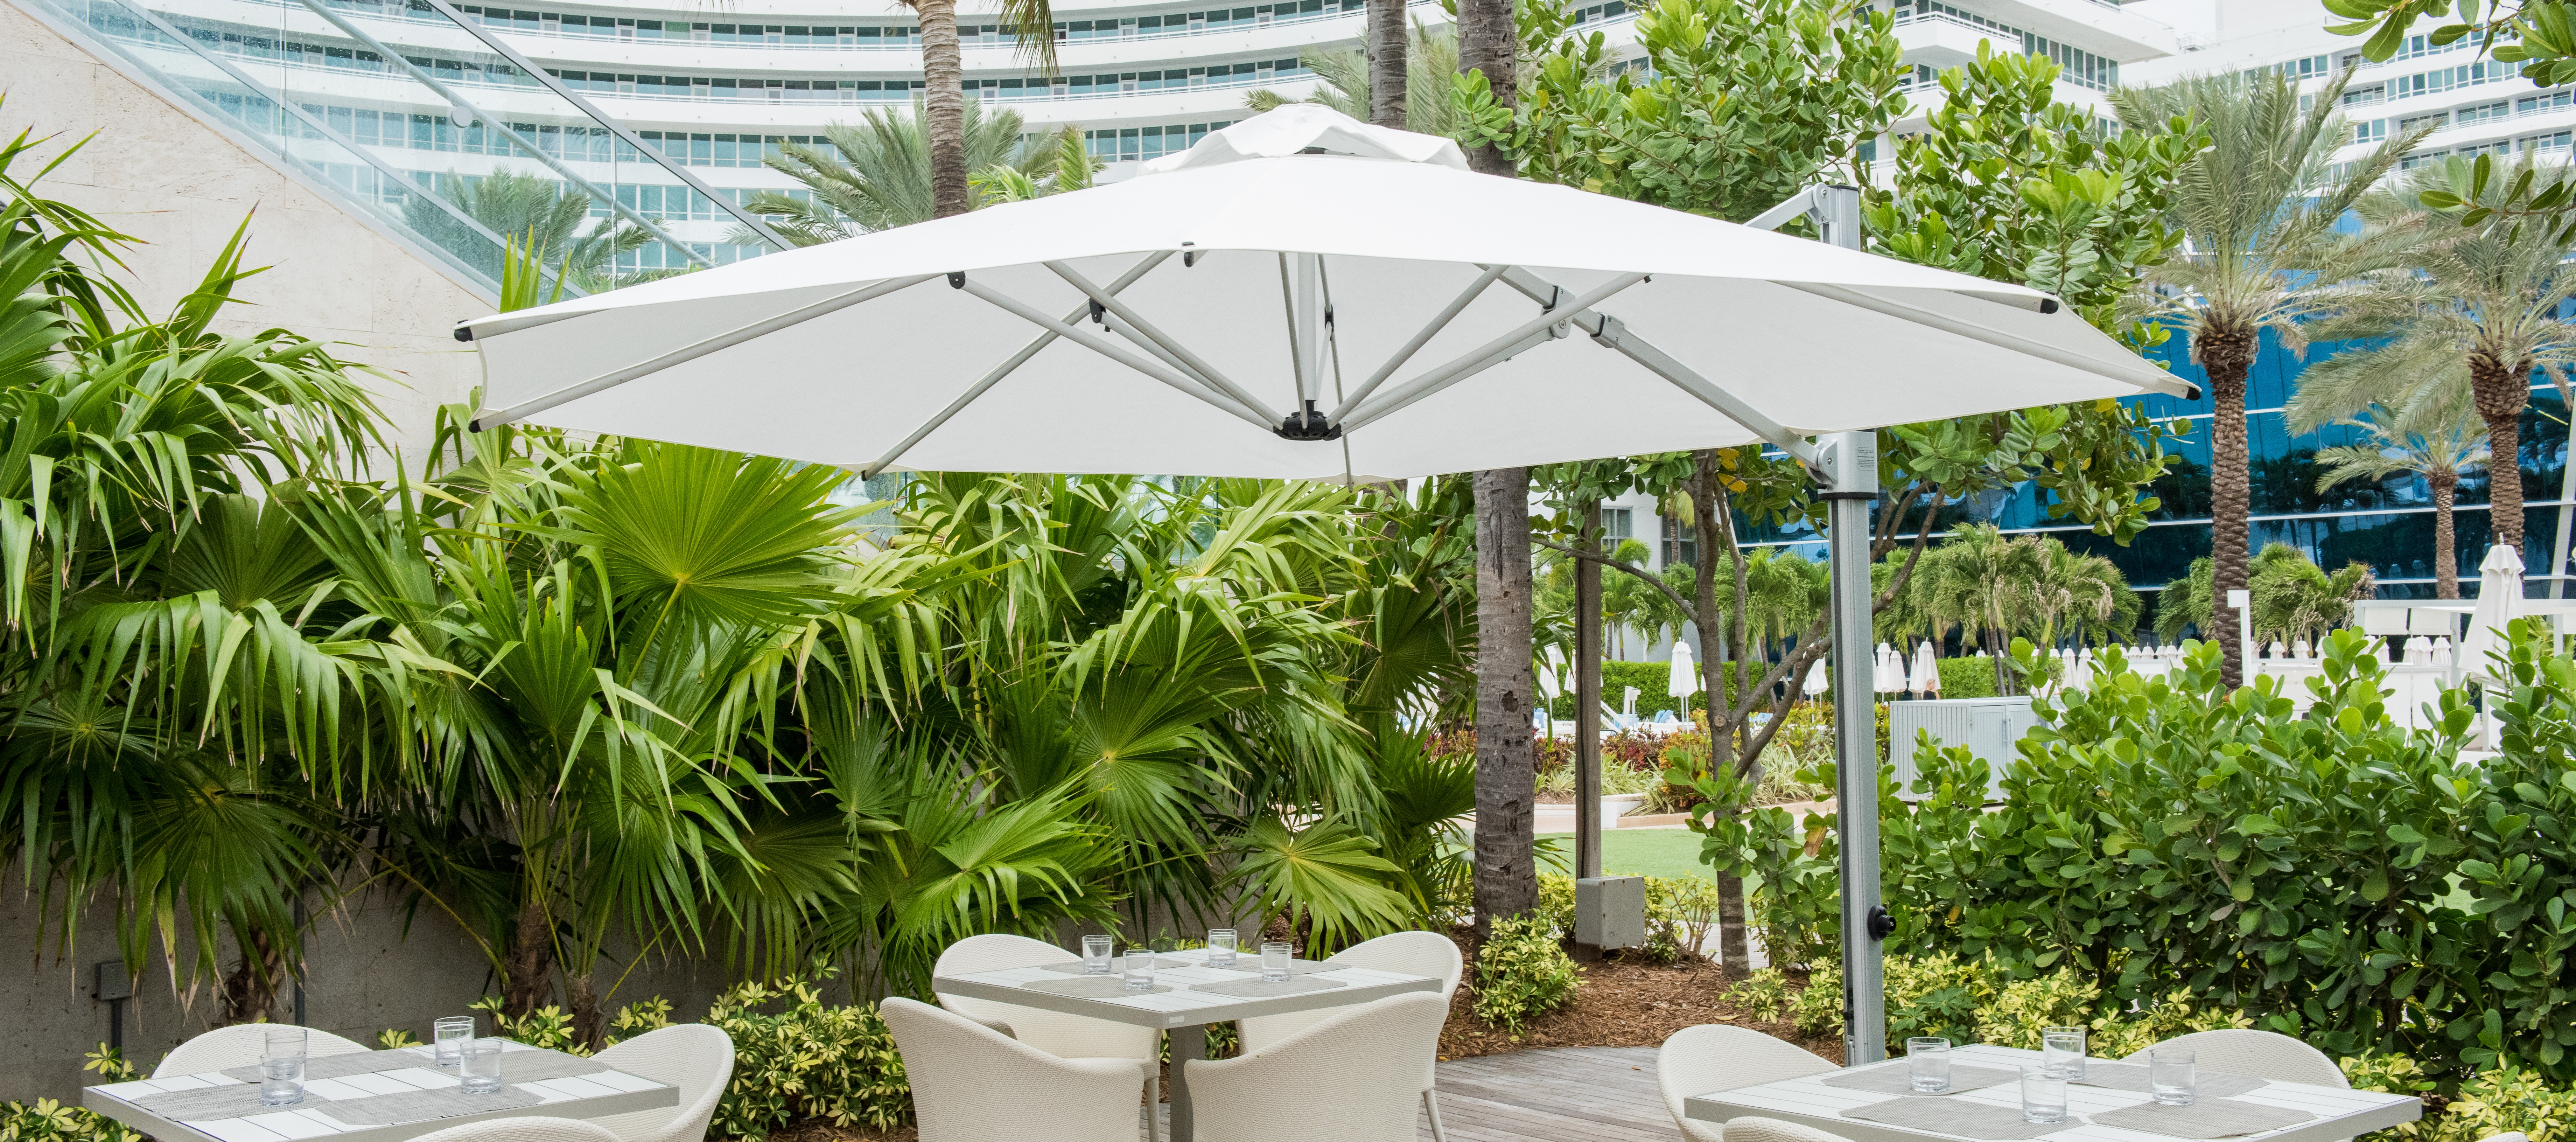 commercial-cantilver-umbrella-white-lifestyle.jpg